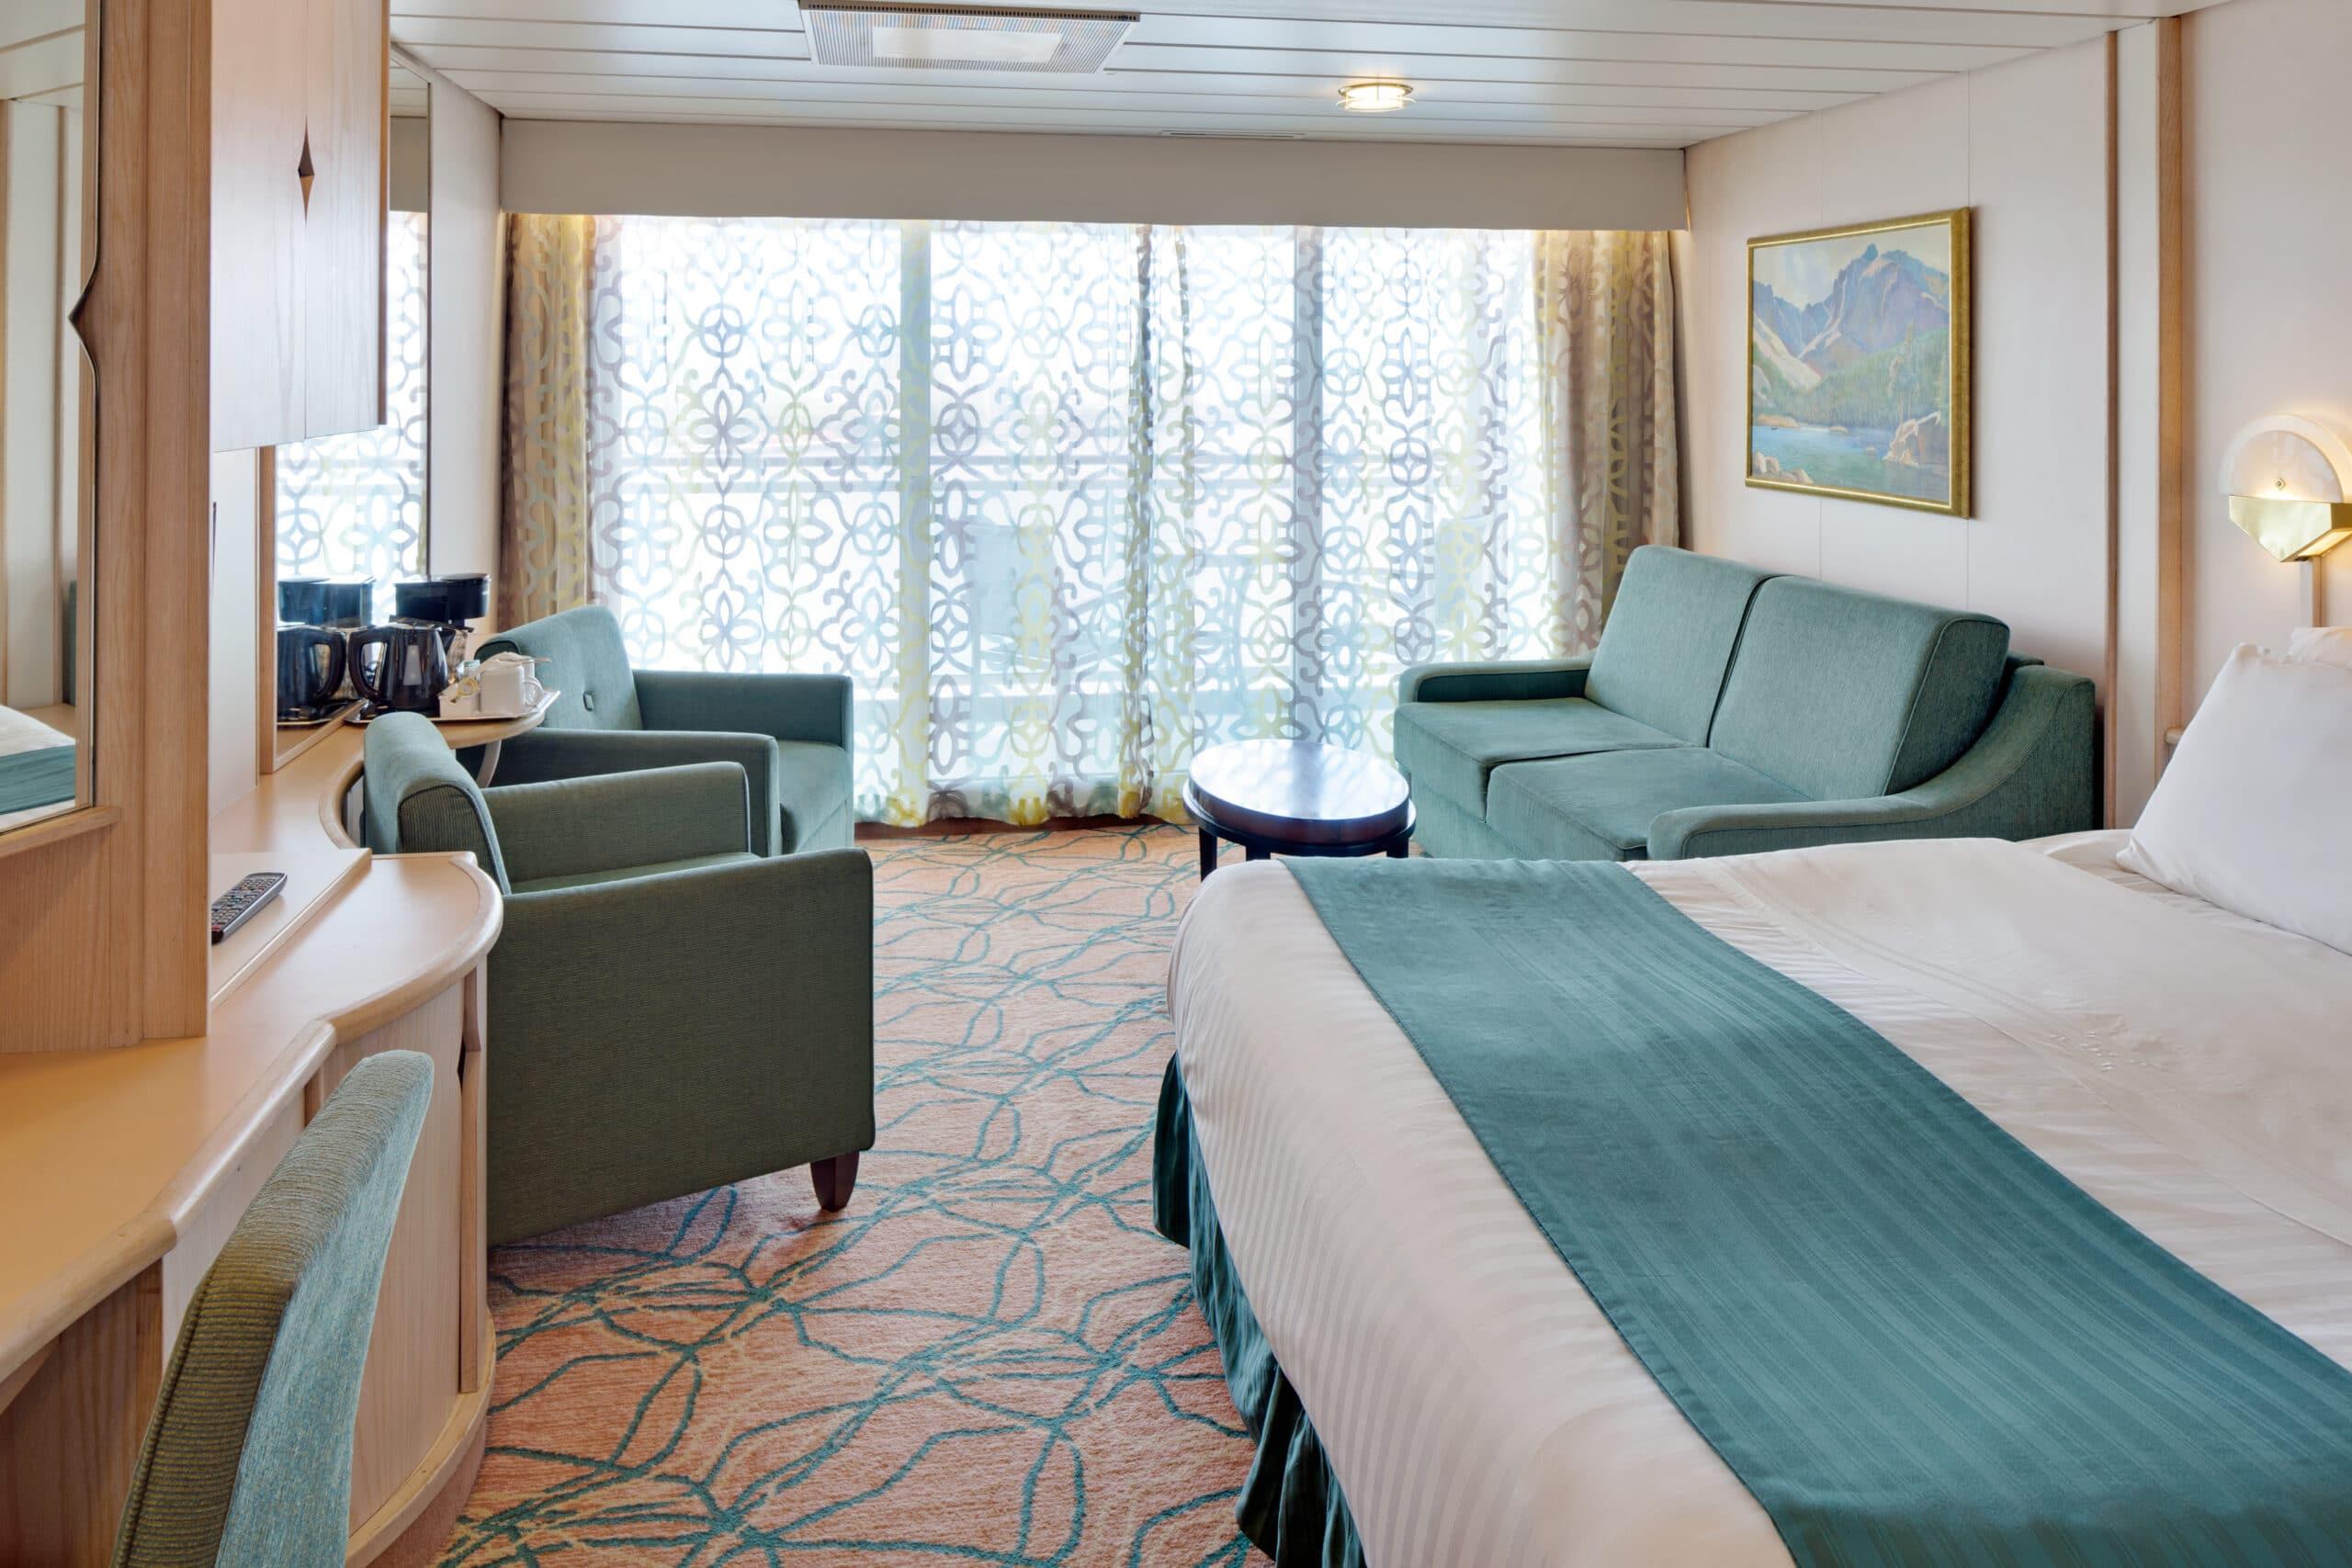 Royal-Caribbean-International-Rhapsody-of-the-Seas-schip-cruiseschip-categorie-J3-J4-junior-suite